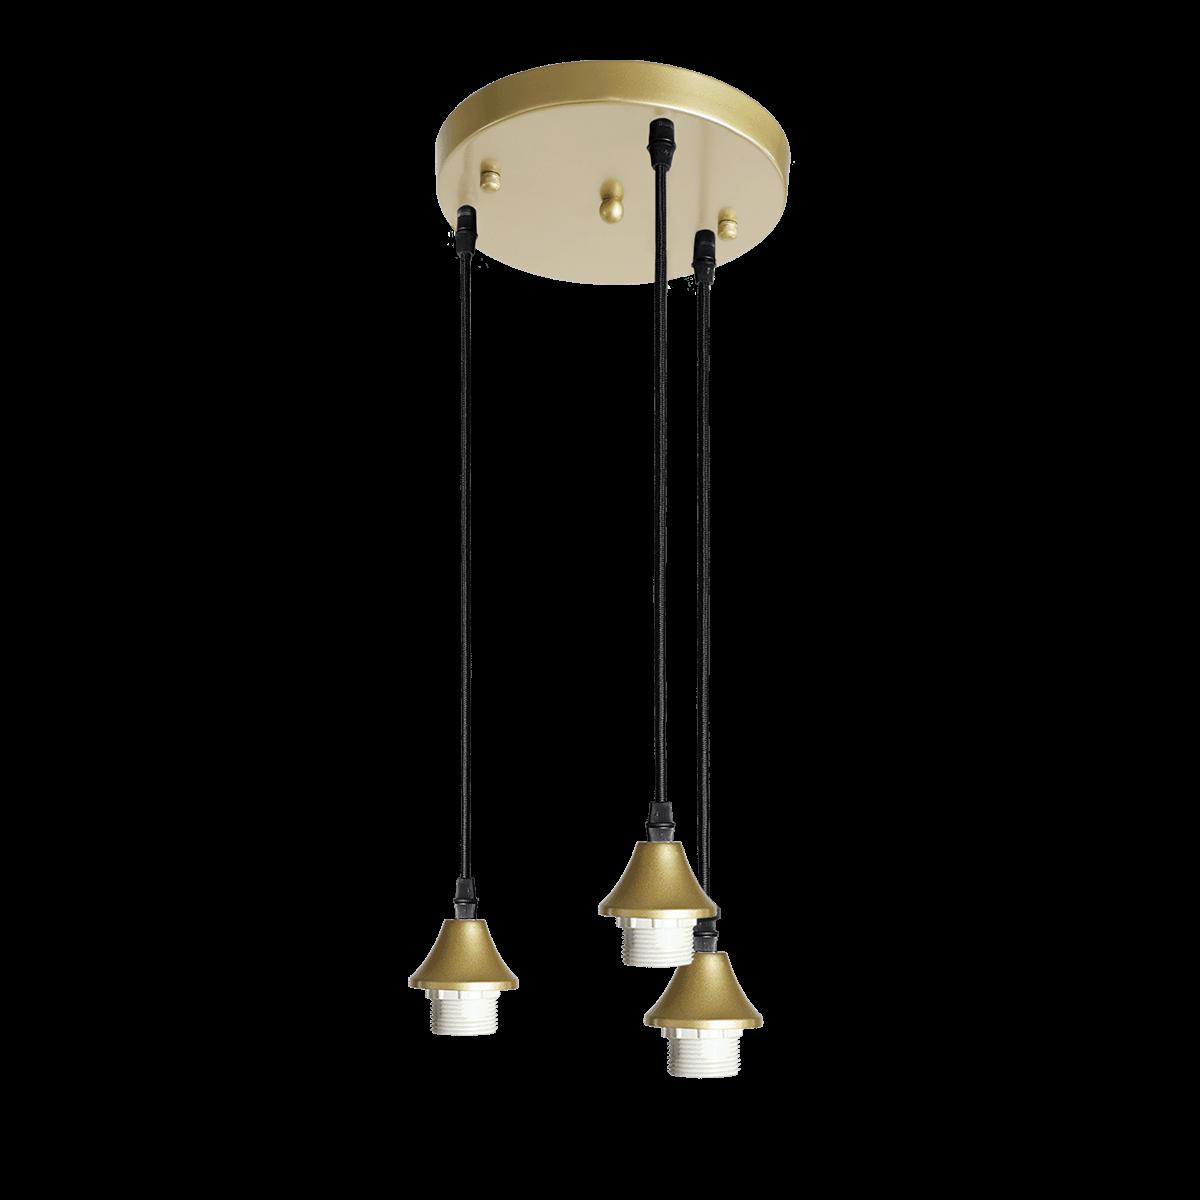 Hanglamp Vilmar 3 lichts goud